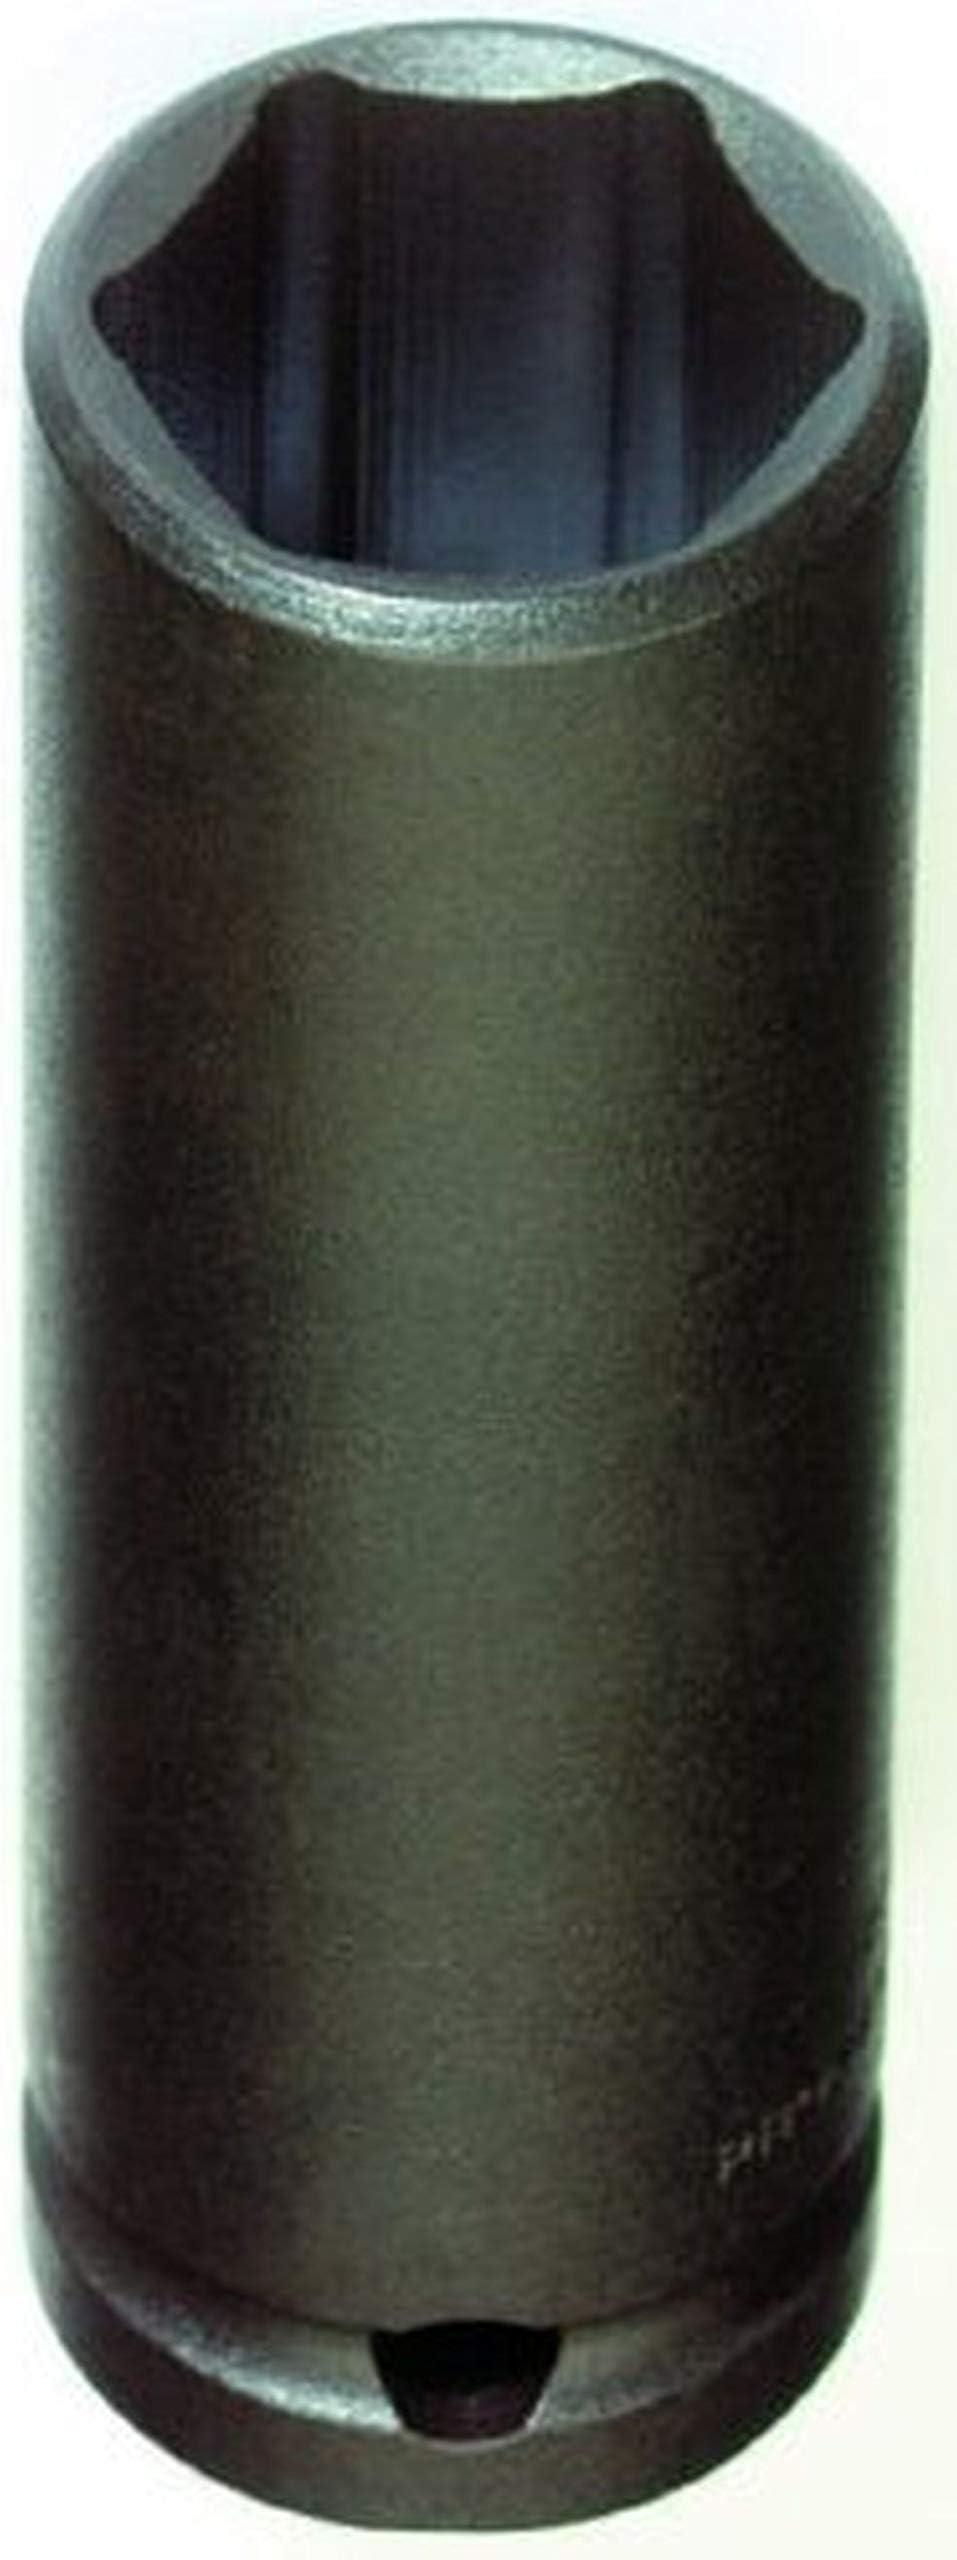 KT Pro Tools D1330M19 3//8 Drive 6-Point Deep Impact Socket